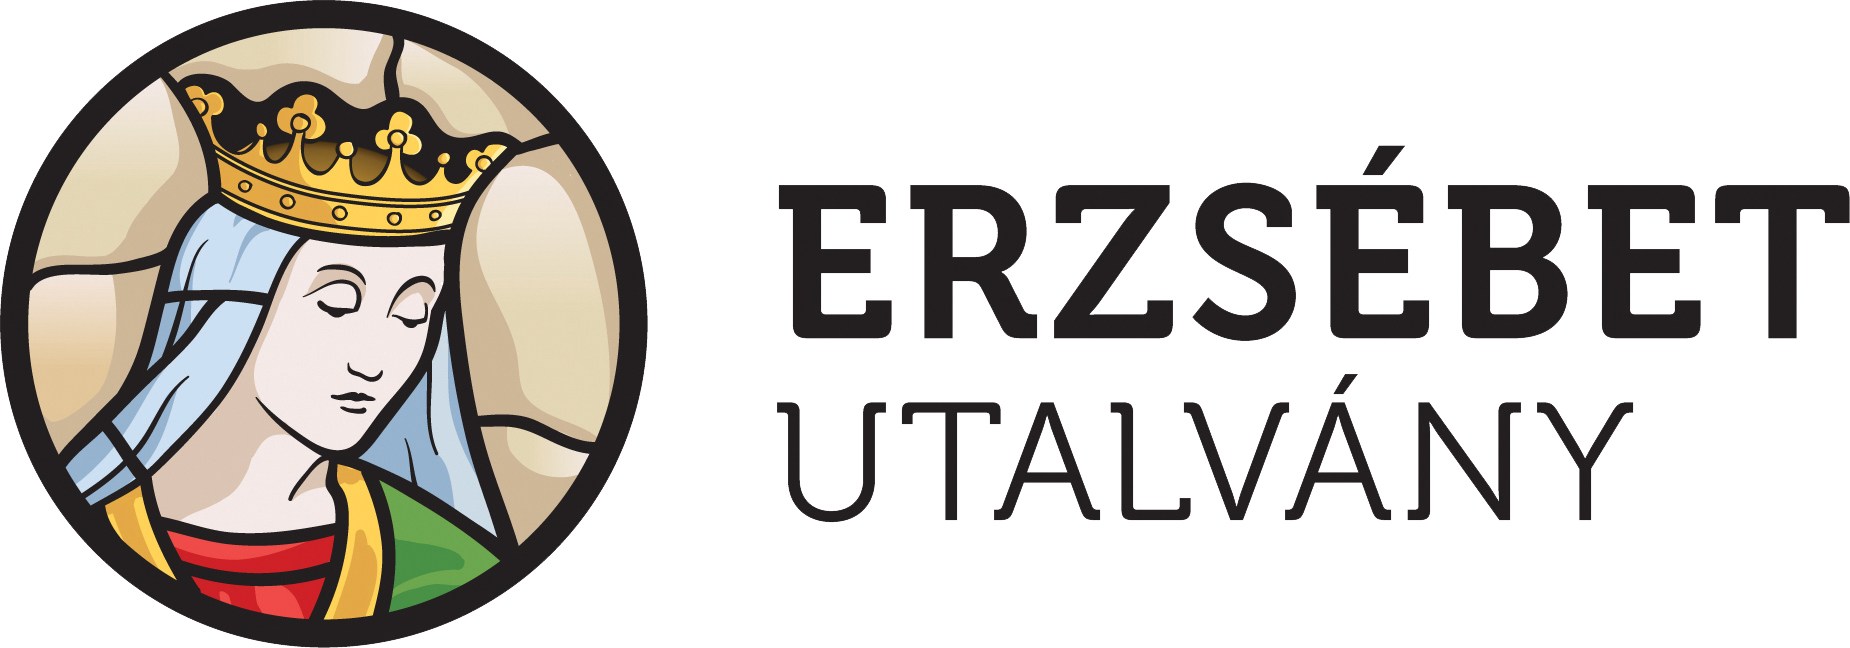 erzsebet_utalvany_logo_original